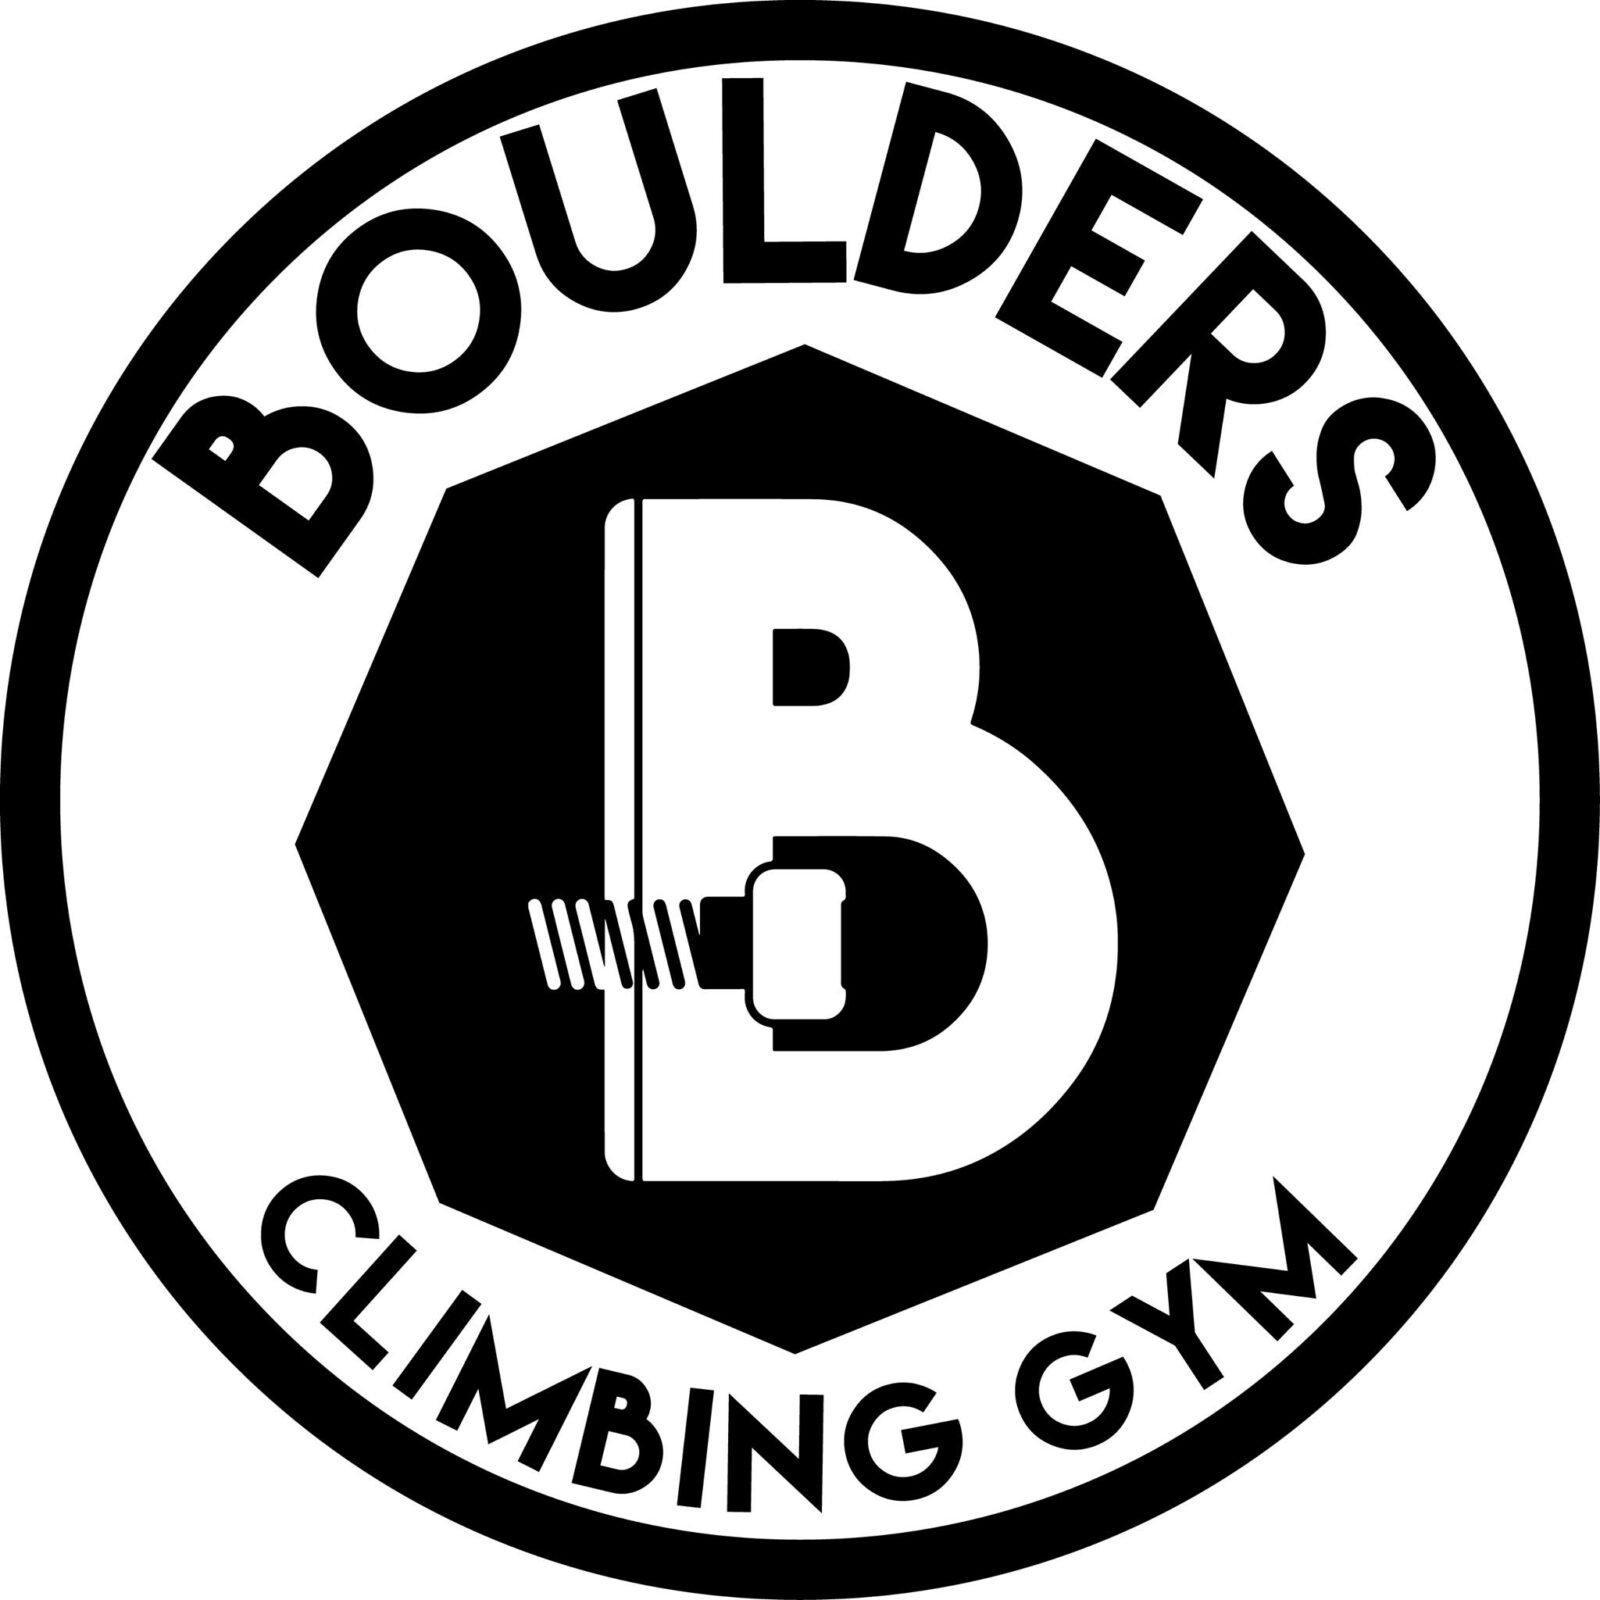 Boulder's Climbing Gym – East